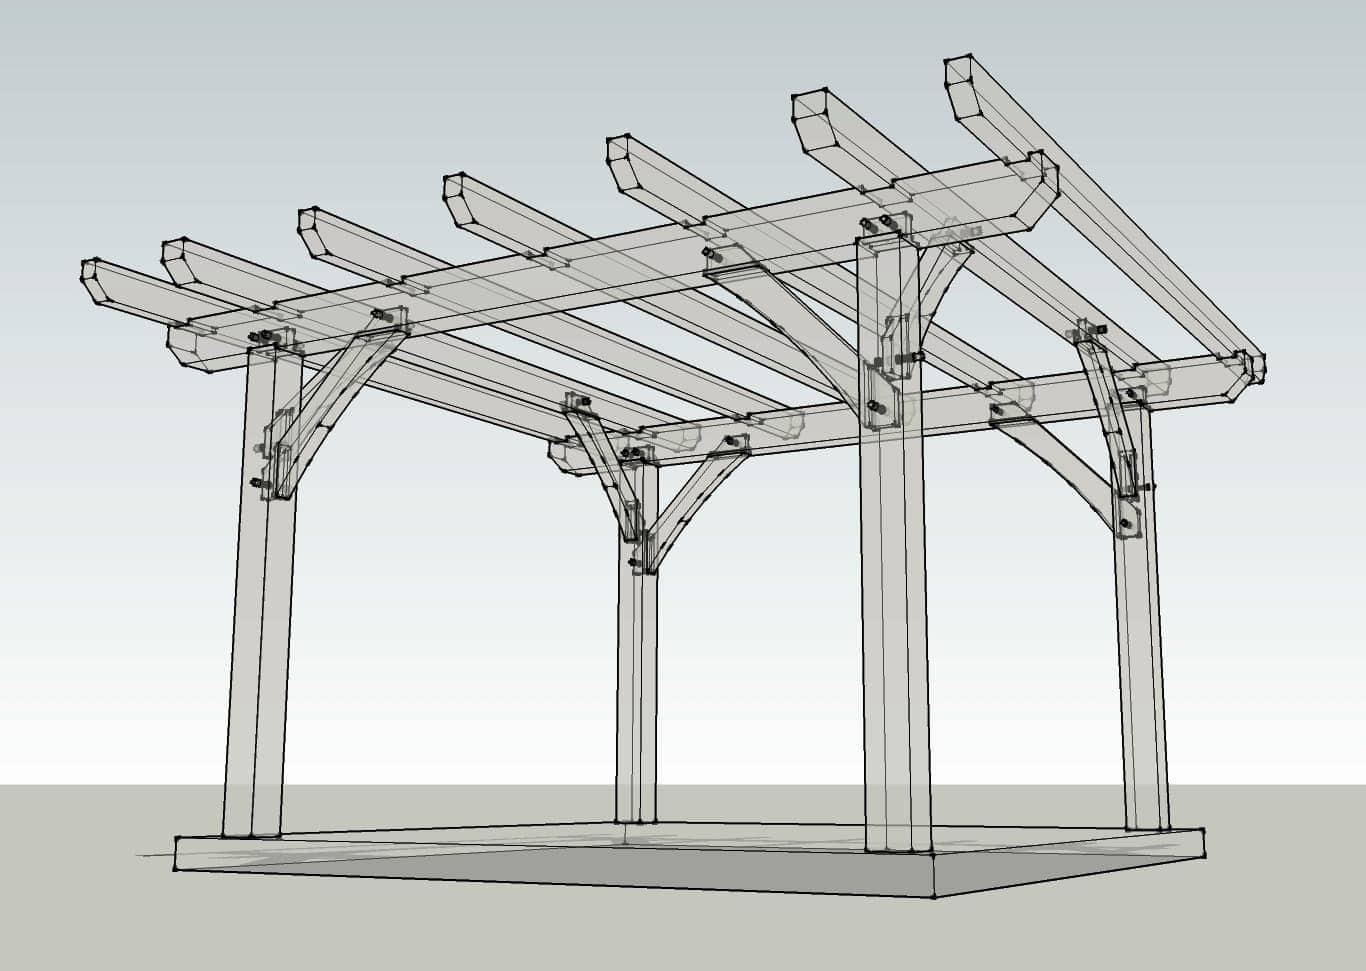 12x12 Timber Frame Pergola Plan Timber Frame Hq